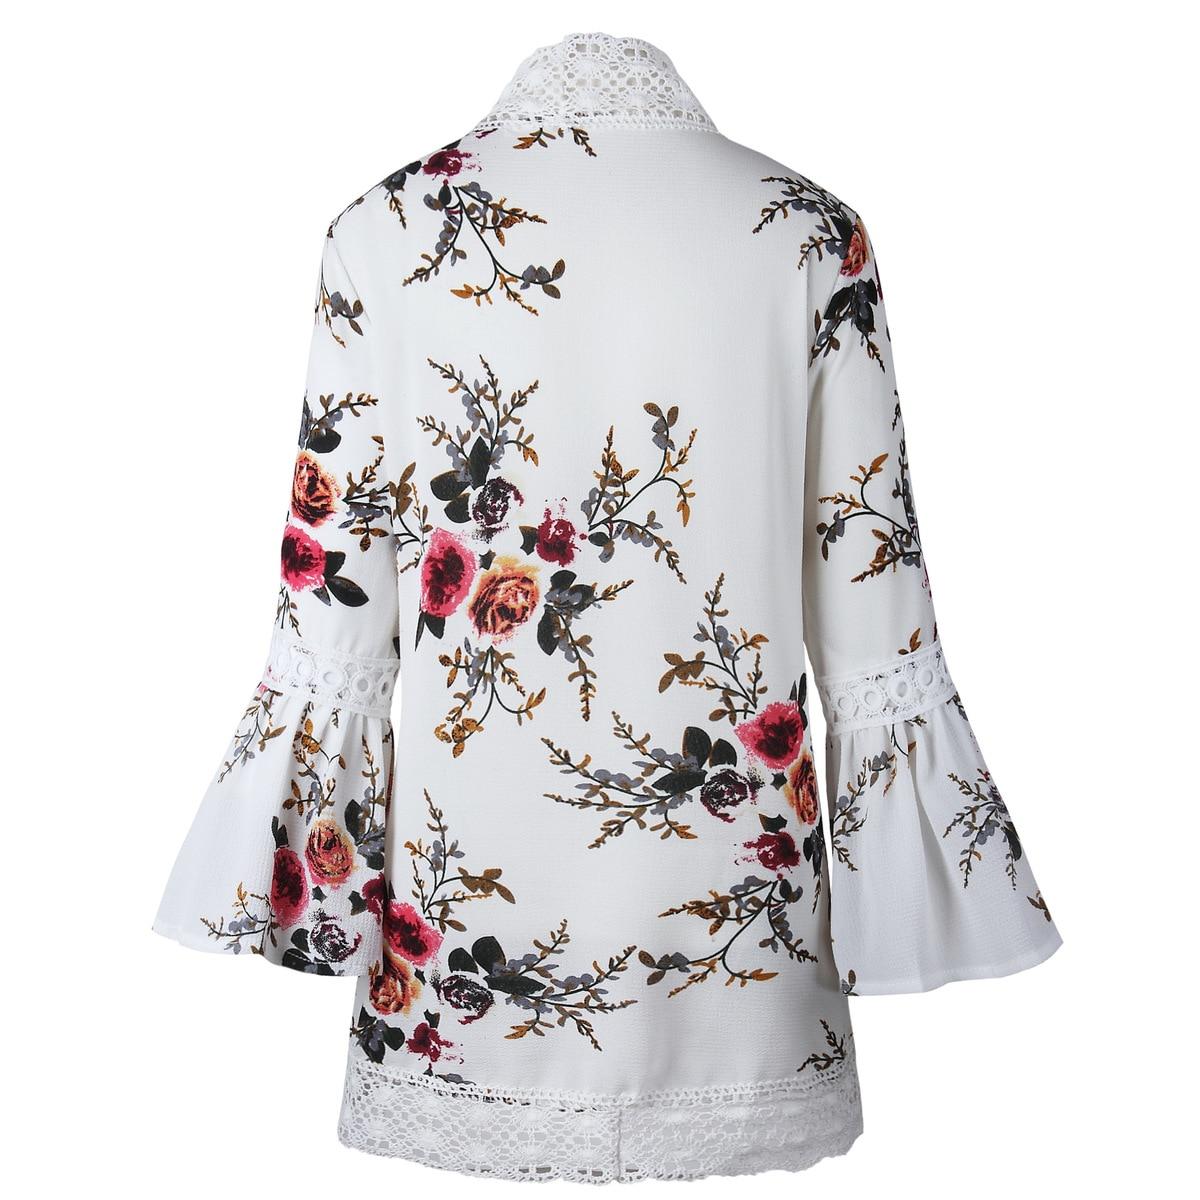 HTB1bnGivZuYBuNkSmRyq6AA3pXa7 Women Plus Size Loose Casual Basic Jackets Female 2018 Autumn Long Flare Sleeve Floral Print Outwear Coat Open Stitch Clothing